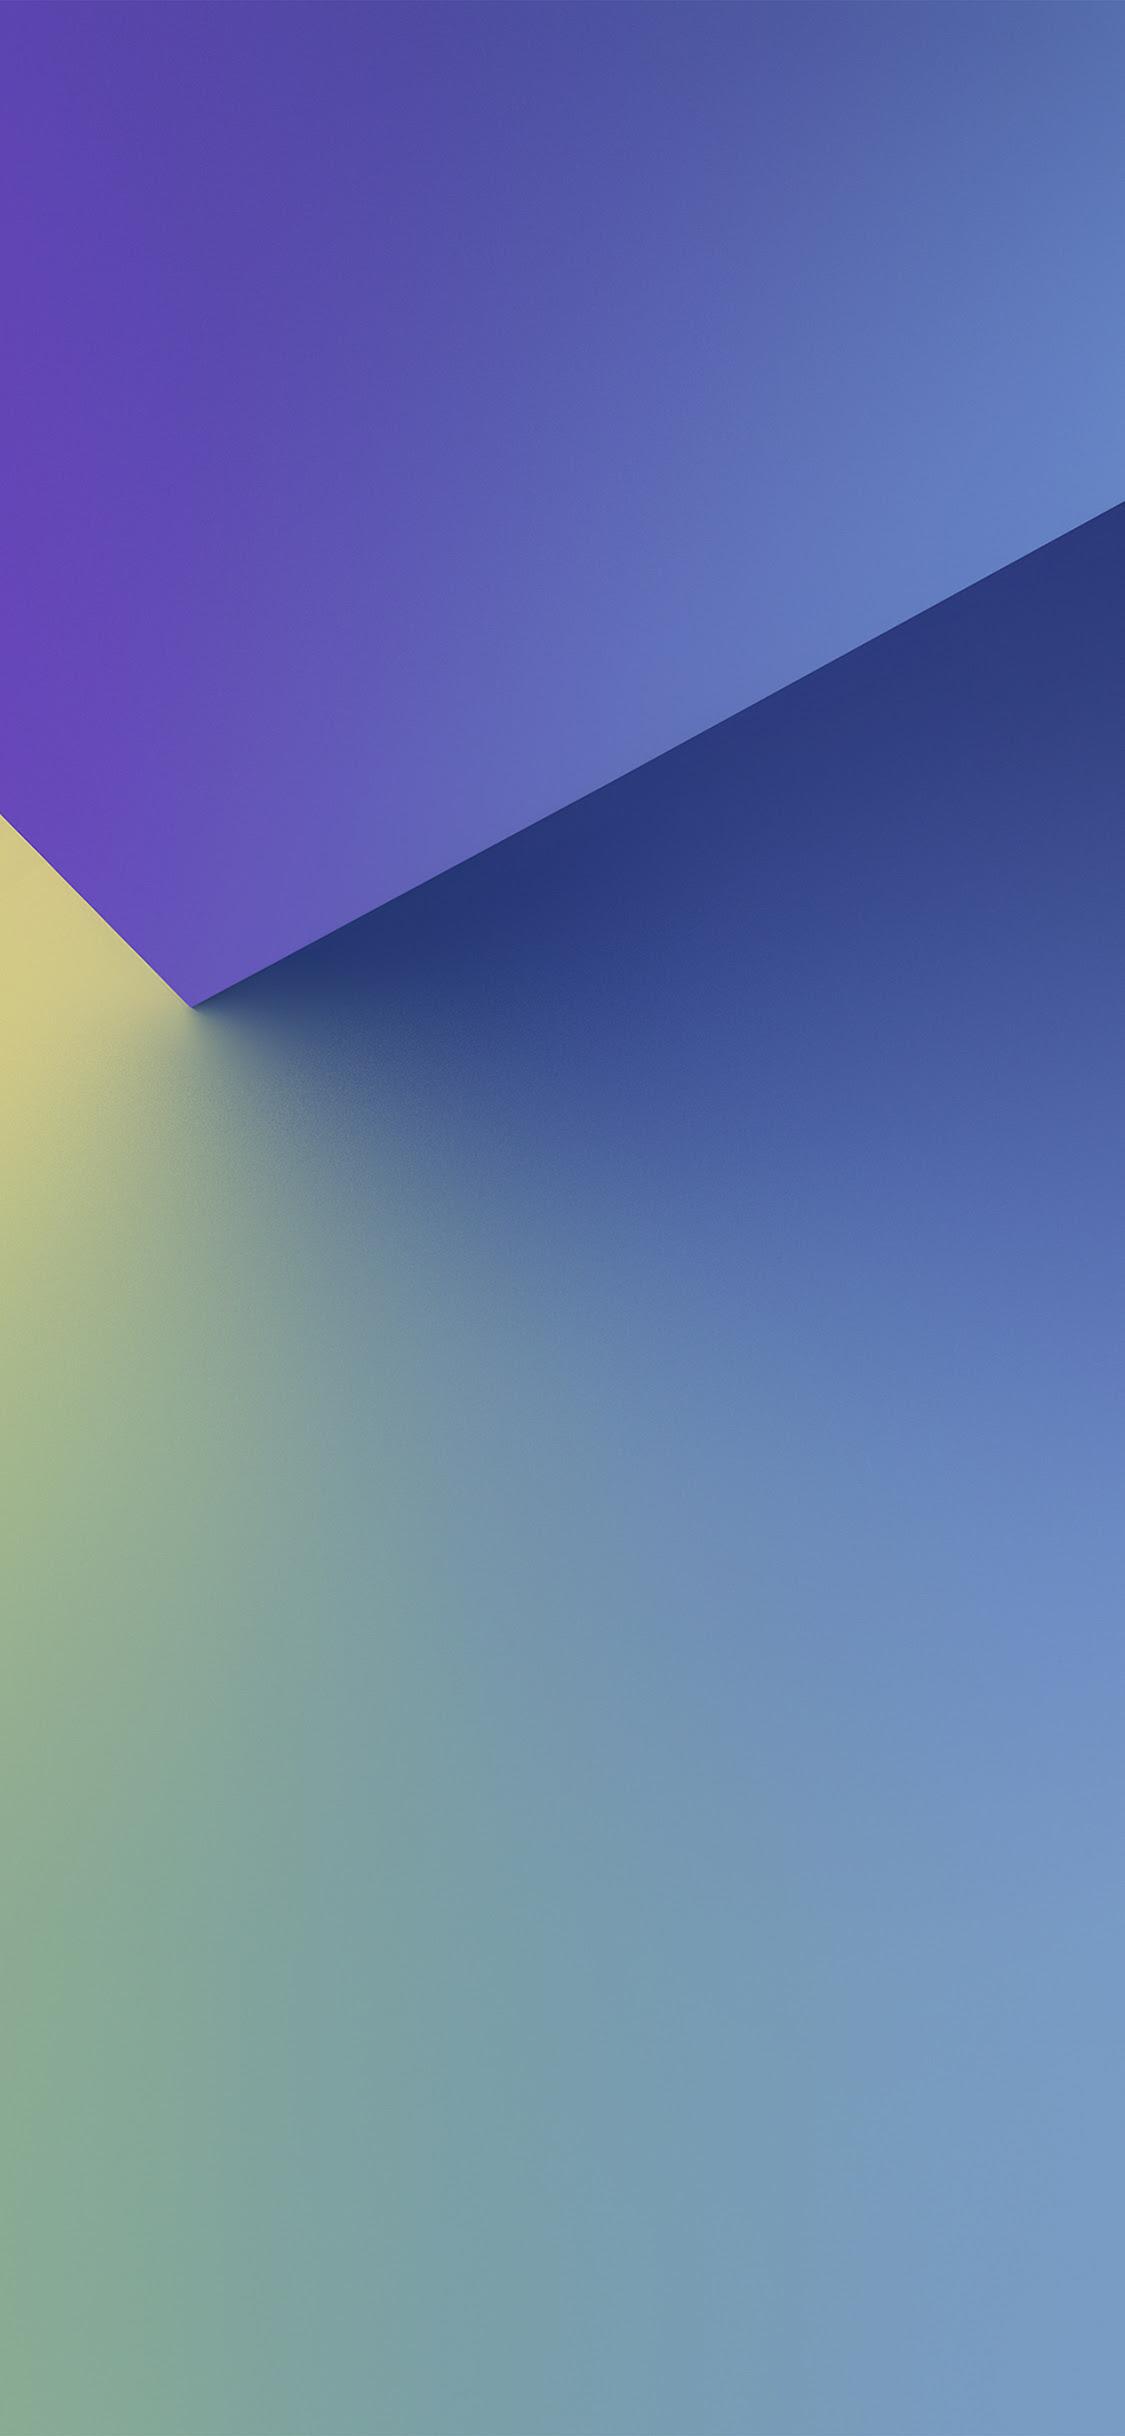 Unduh 430 Background Art Iphone Terbaik